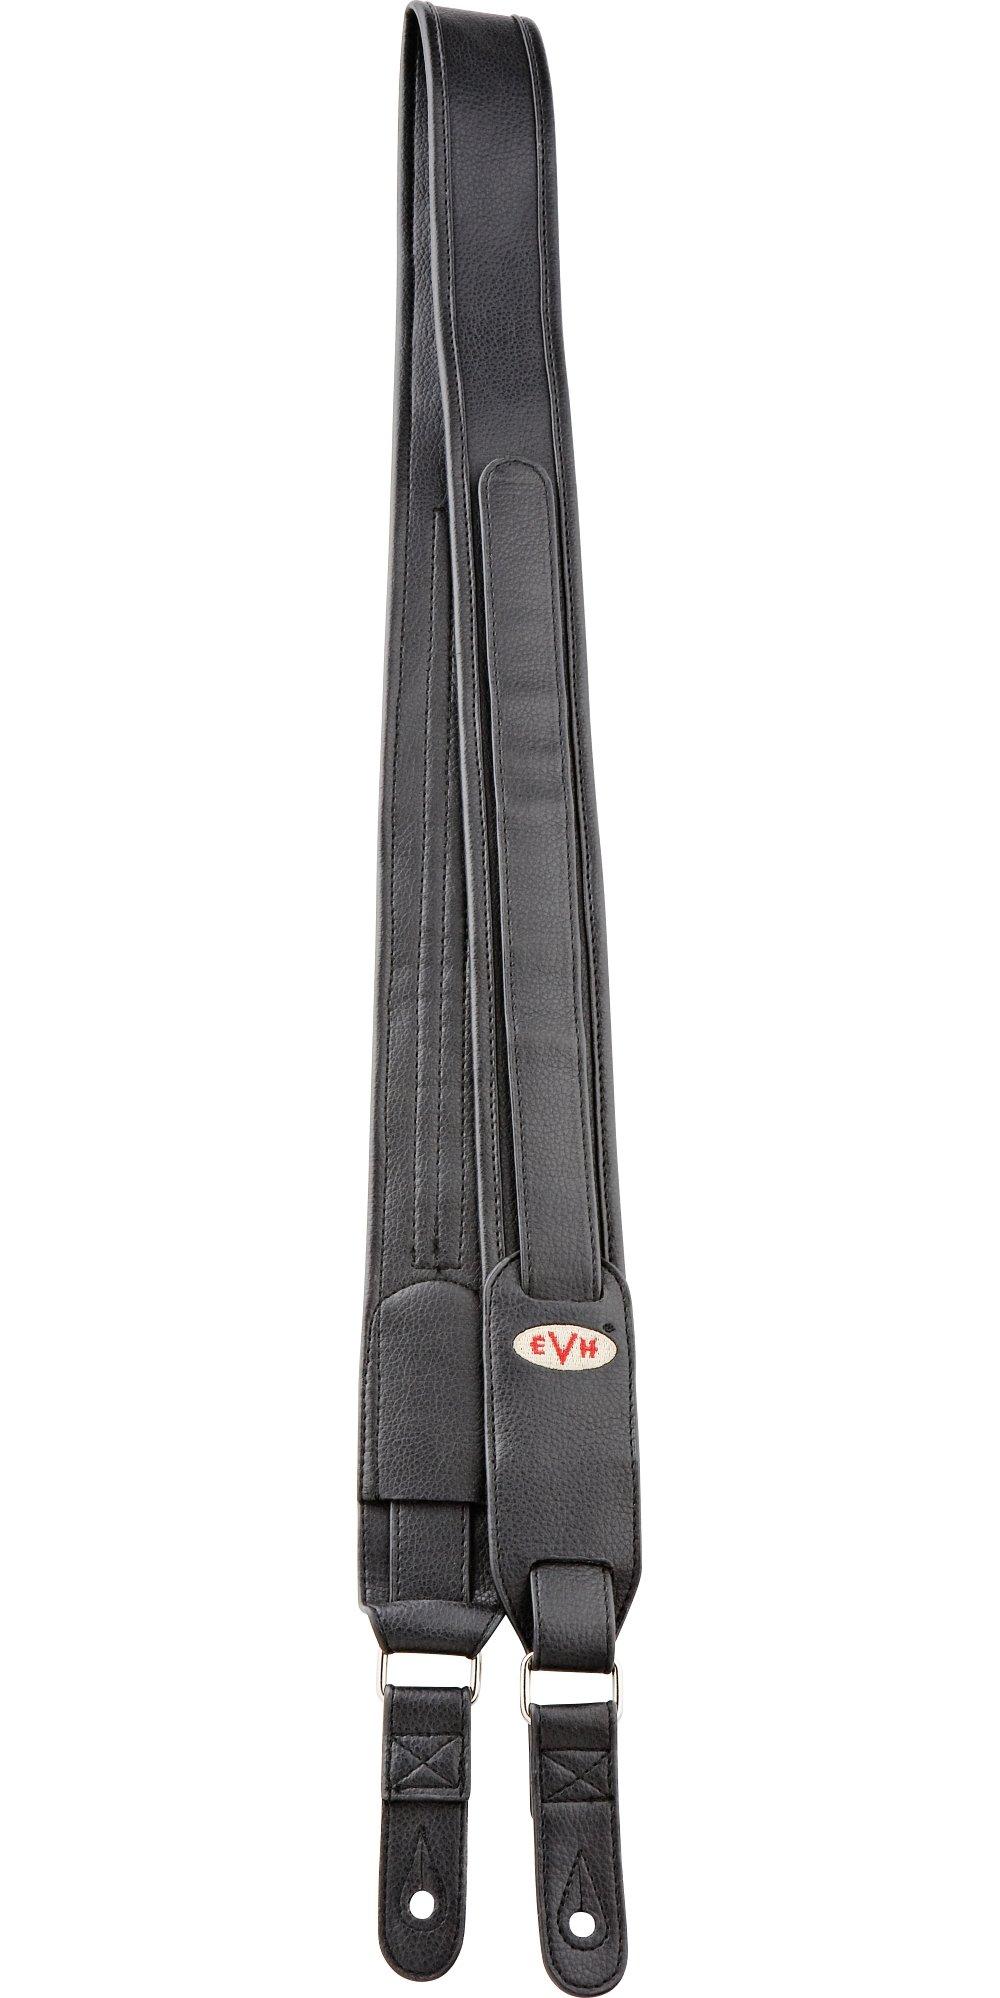 EVH Premium Guitar Strap-Standard